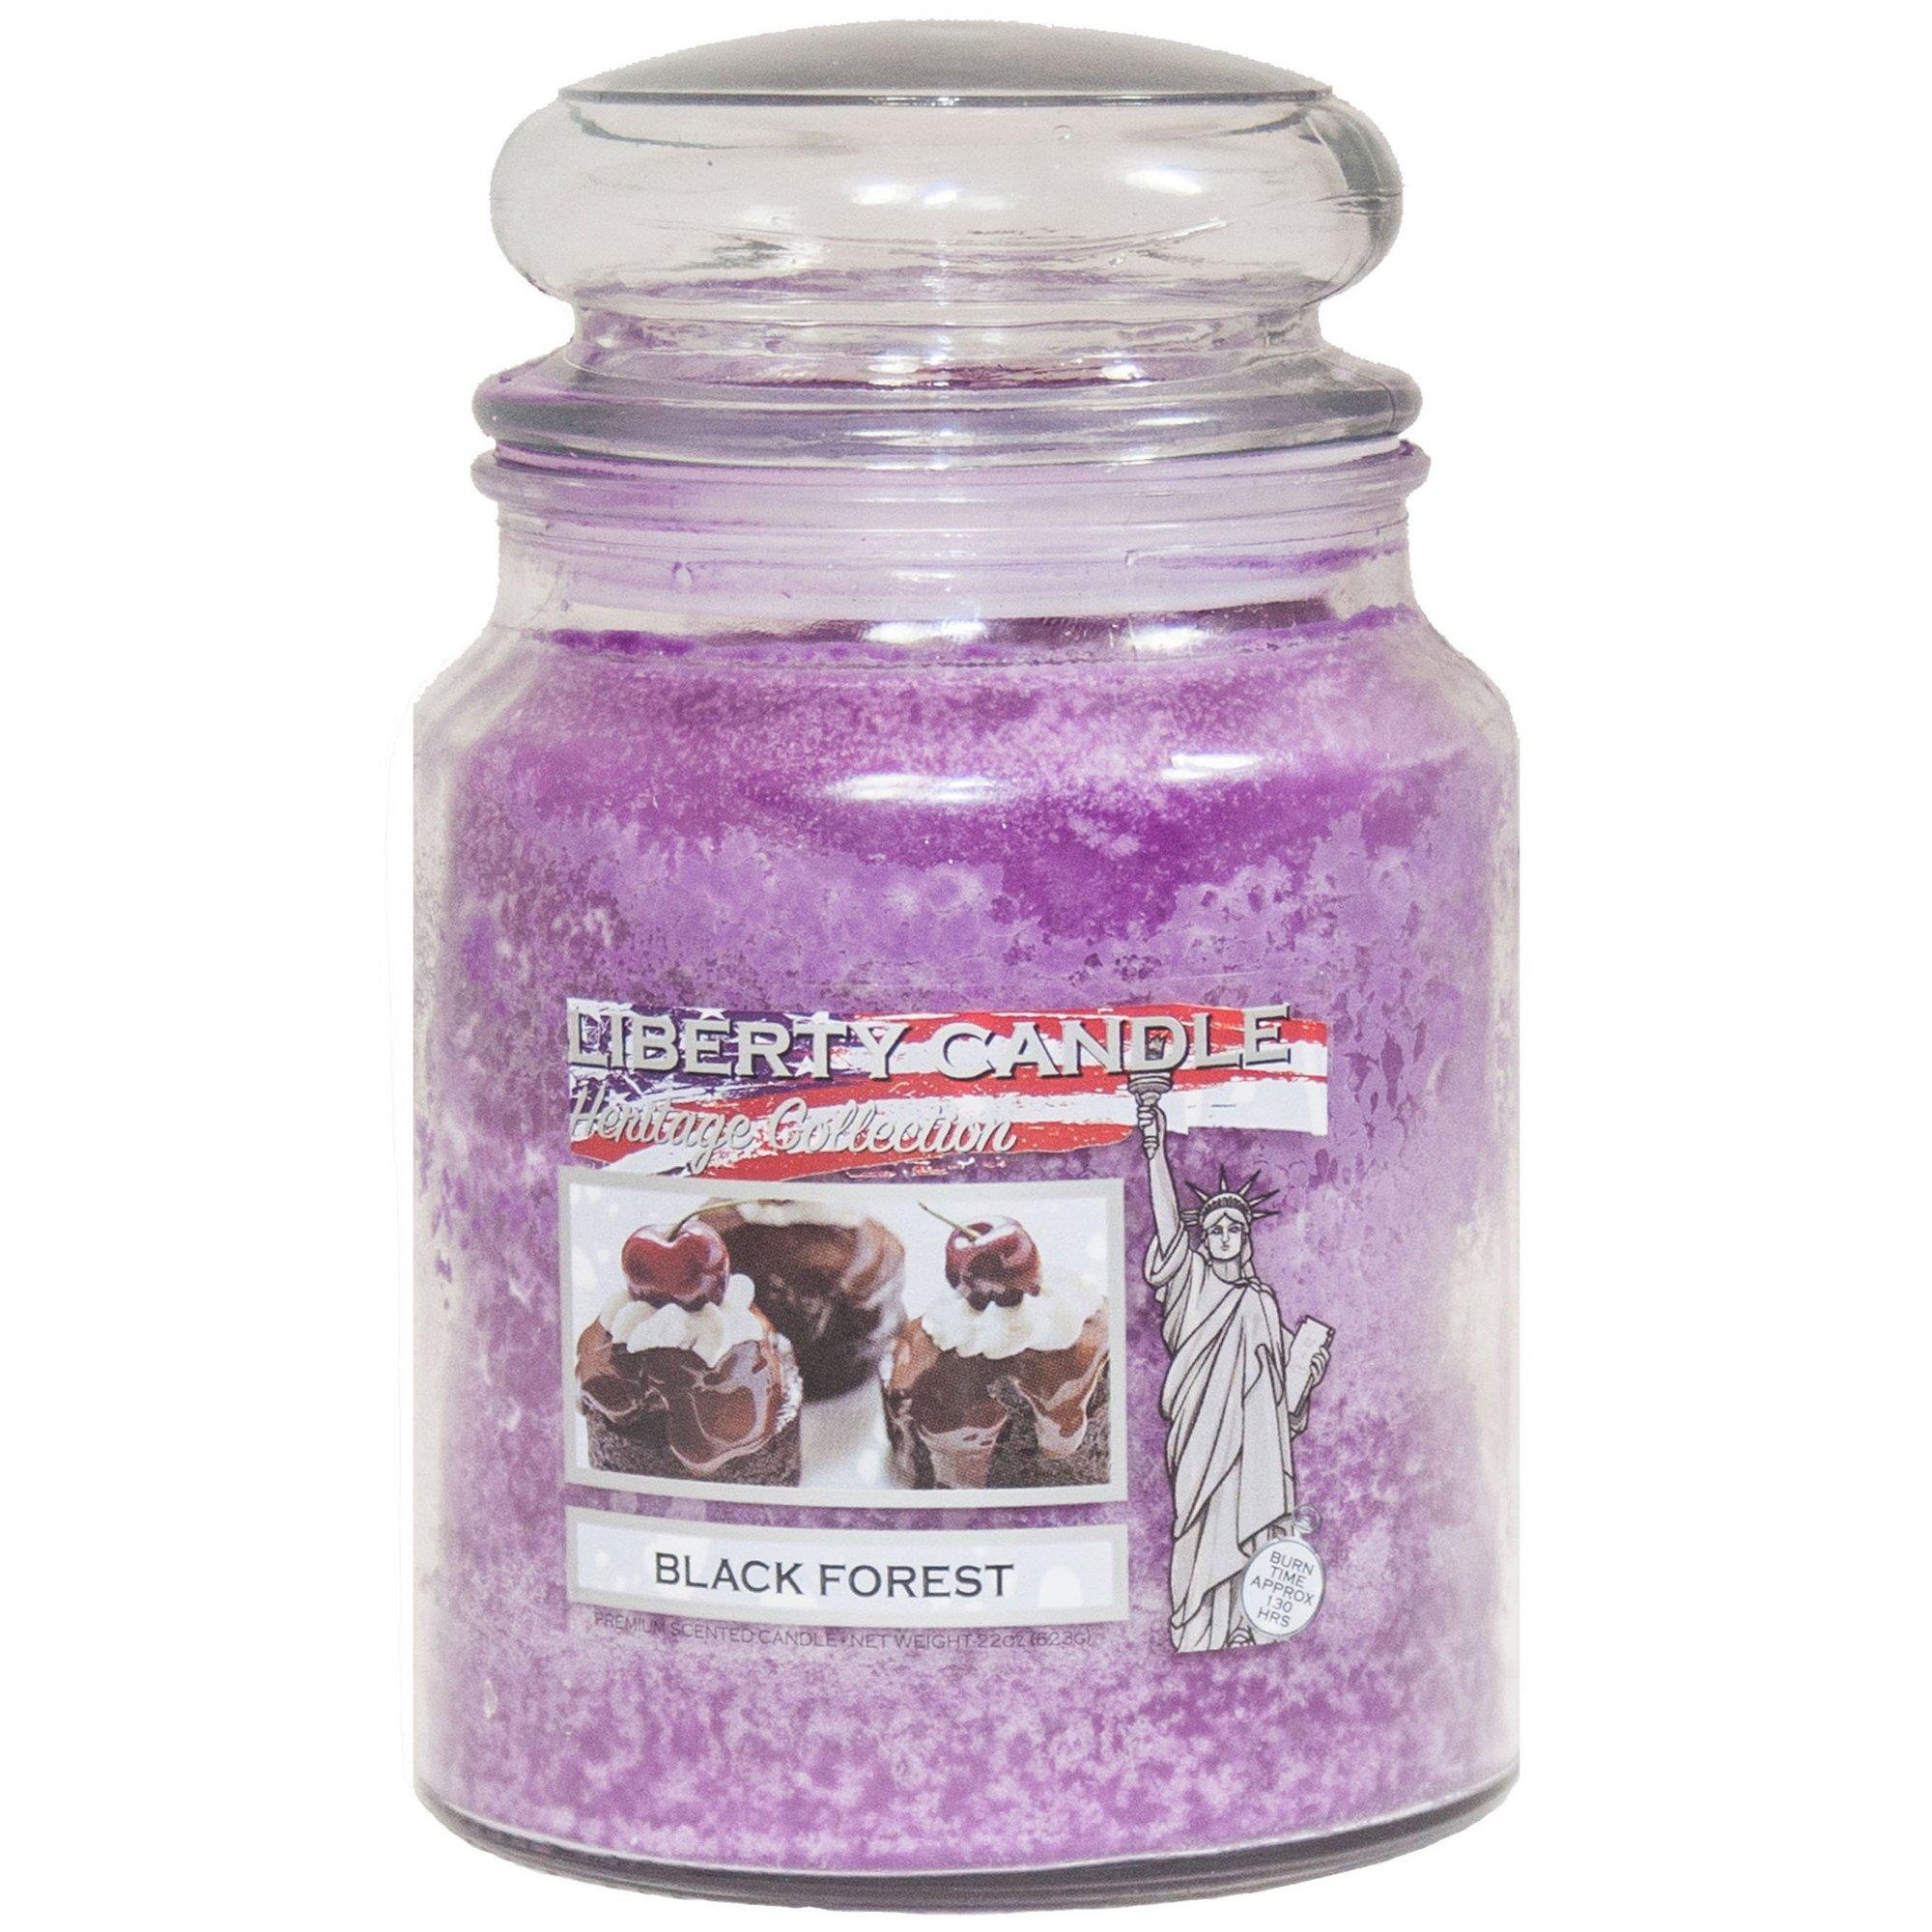 Image of 22oz Glass Jar Candle - Black Forest